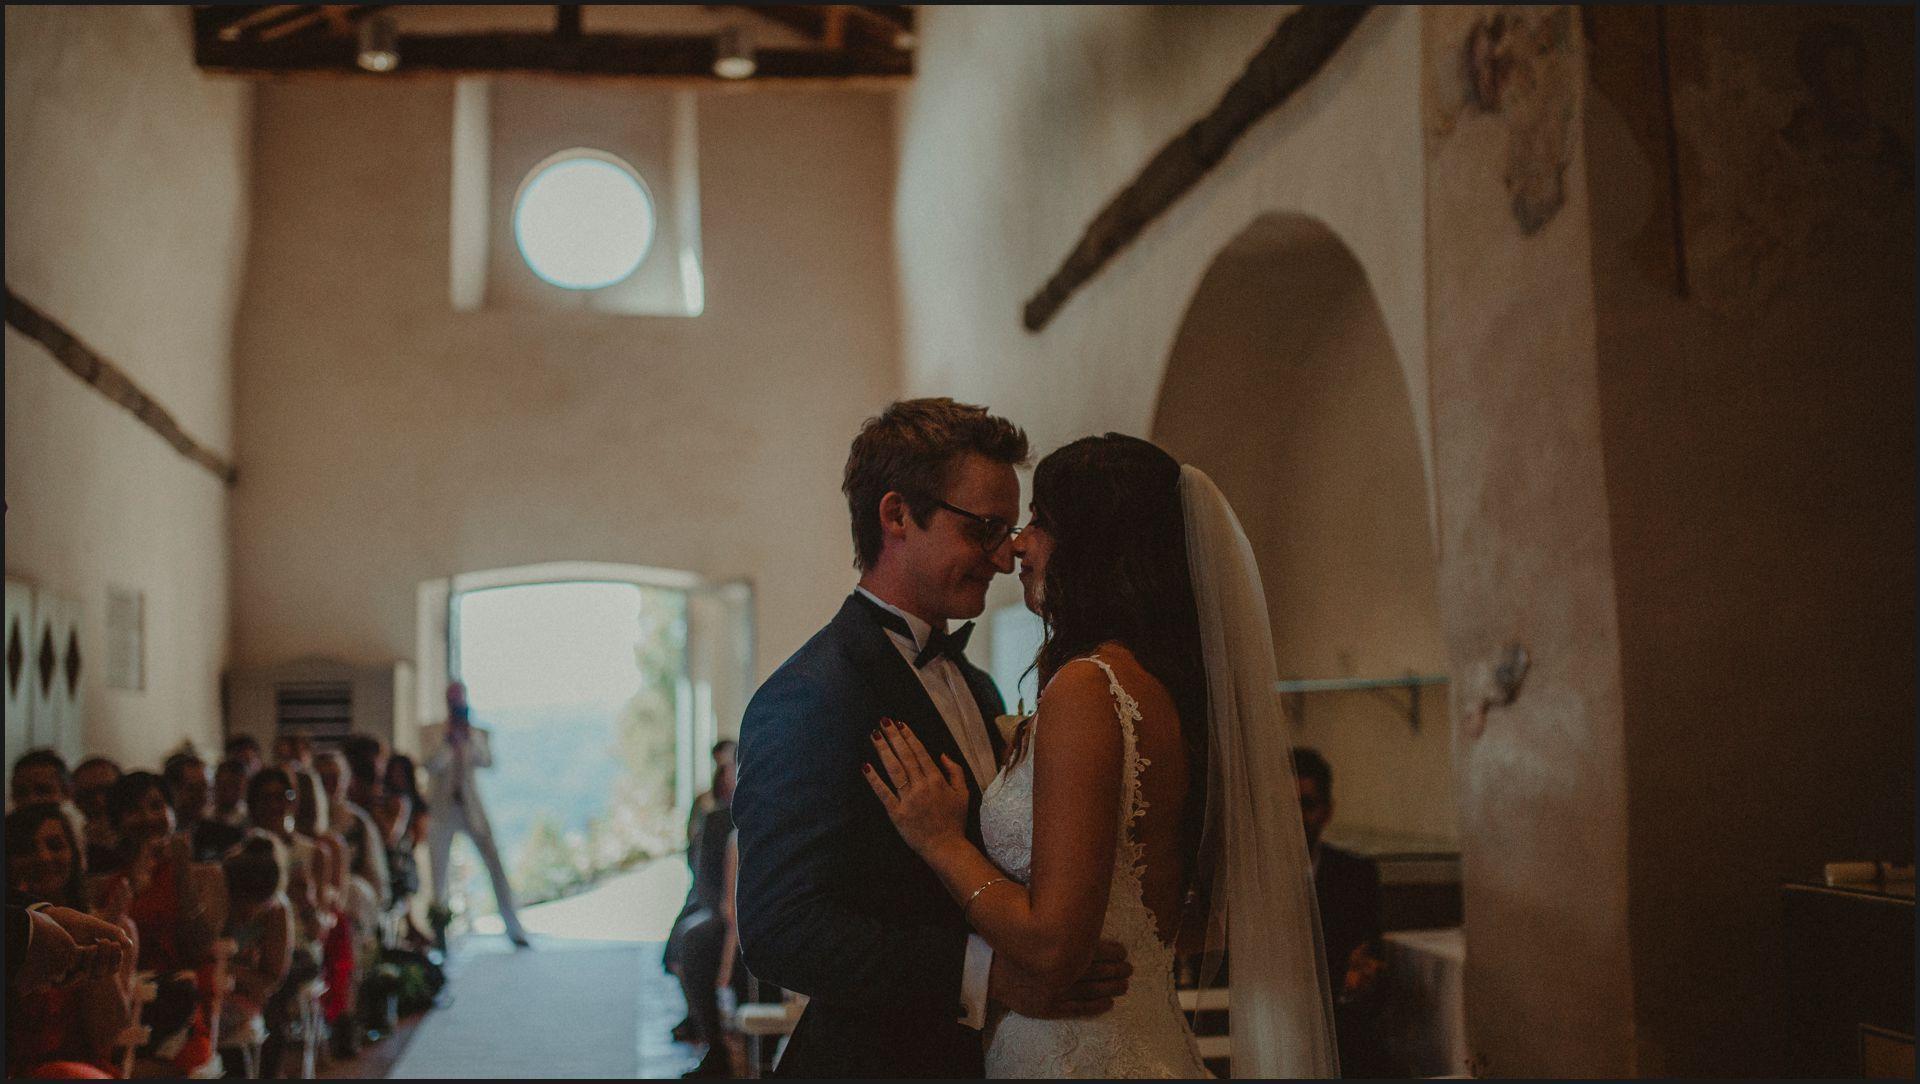 wedding, symbolic ceremony, wedding, umbria, nikis resort, bride, groom, romantic, love